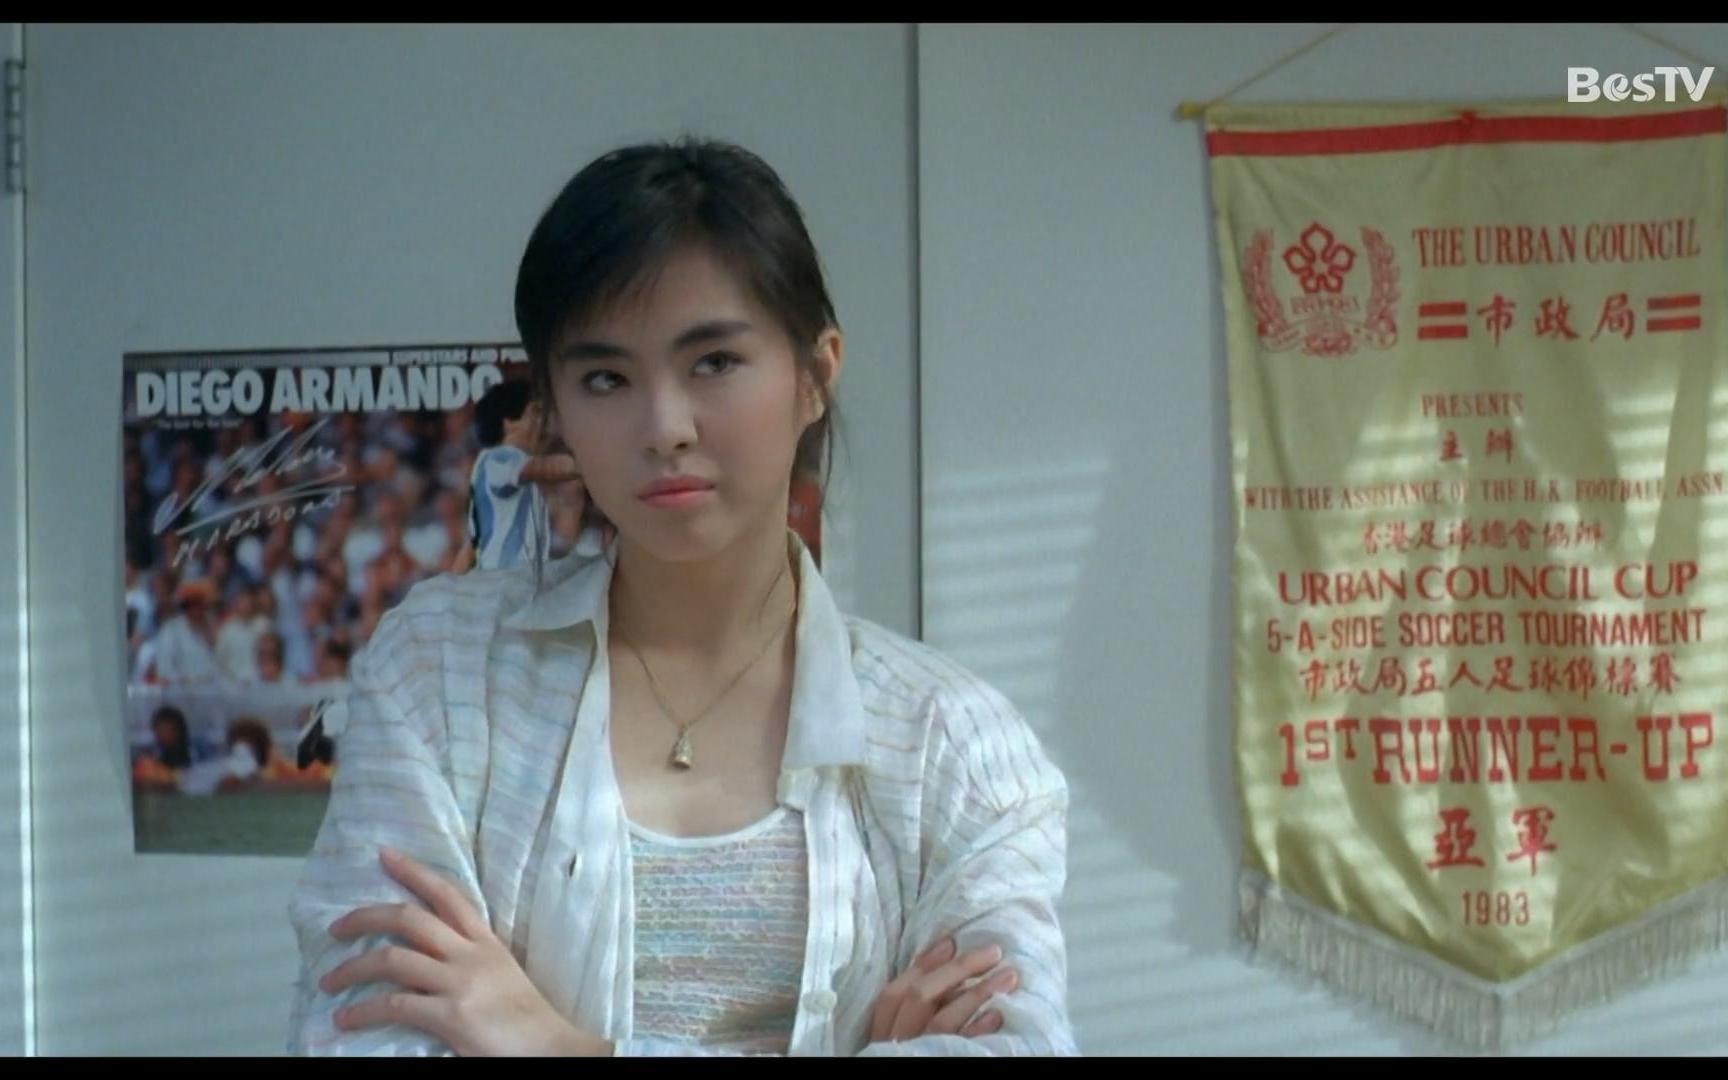 【1080P】【喜剧】杀妻二人组 国语中字(1986)(周润发 王祖贤 梅艳芳 钟镇涛)